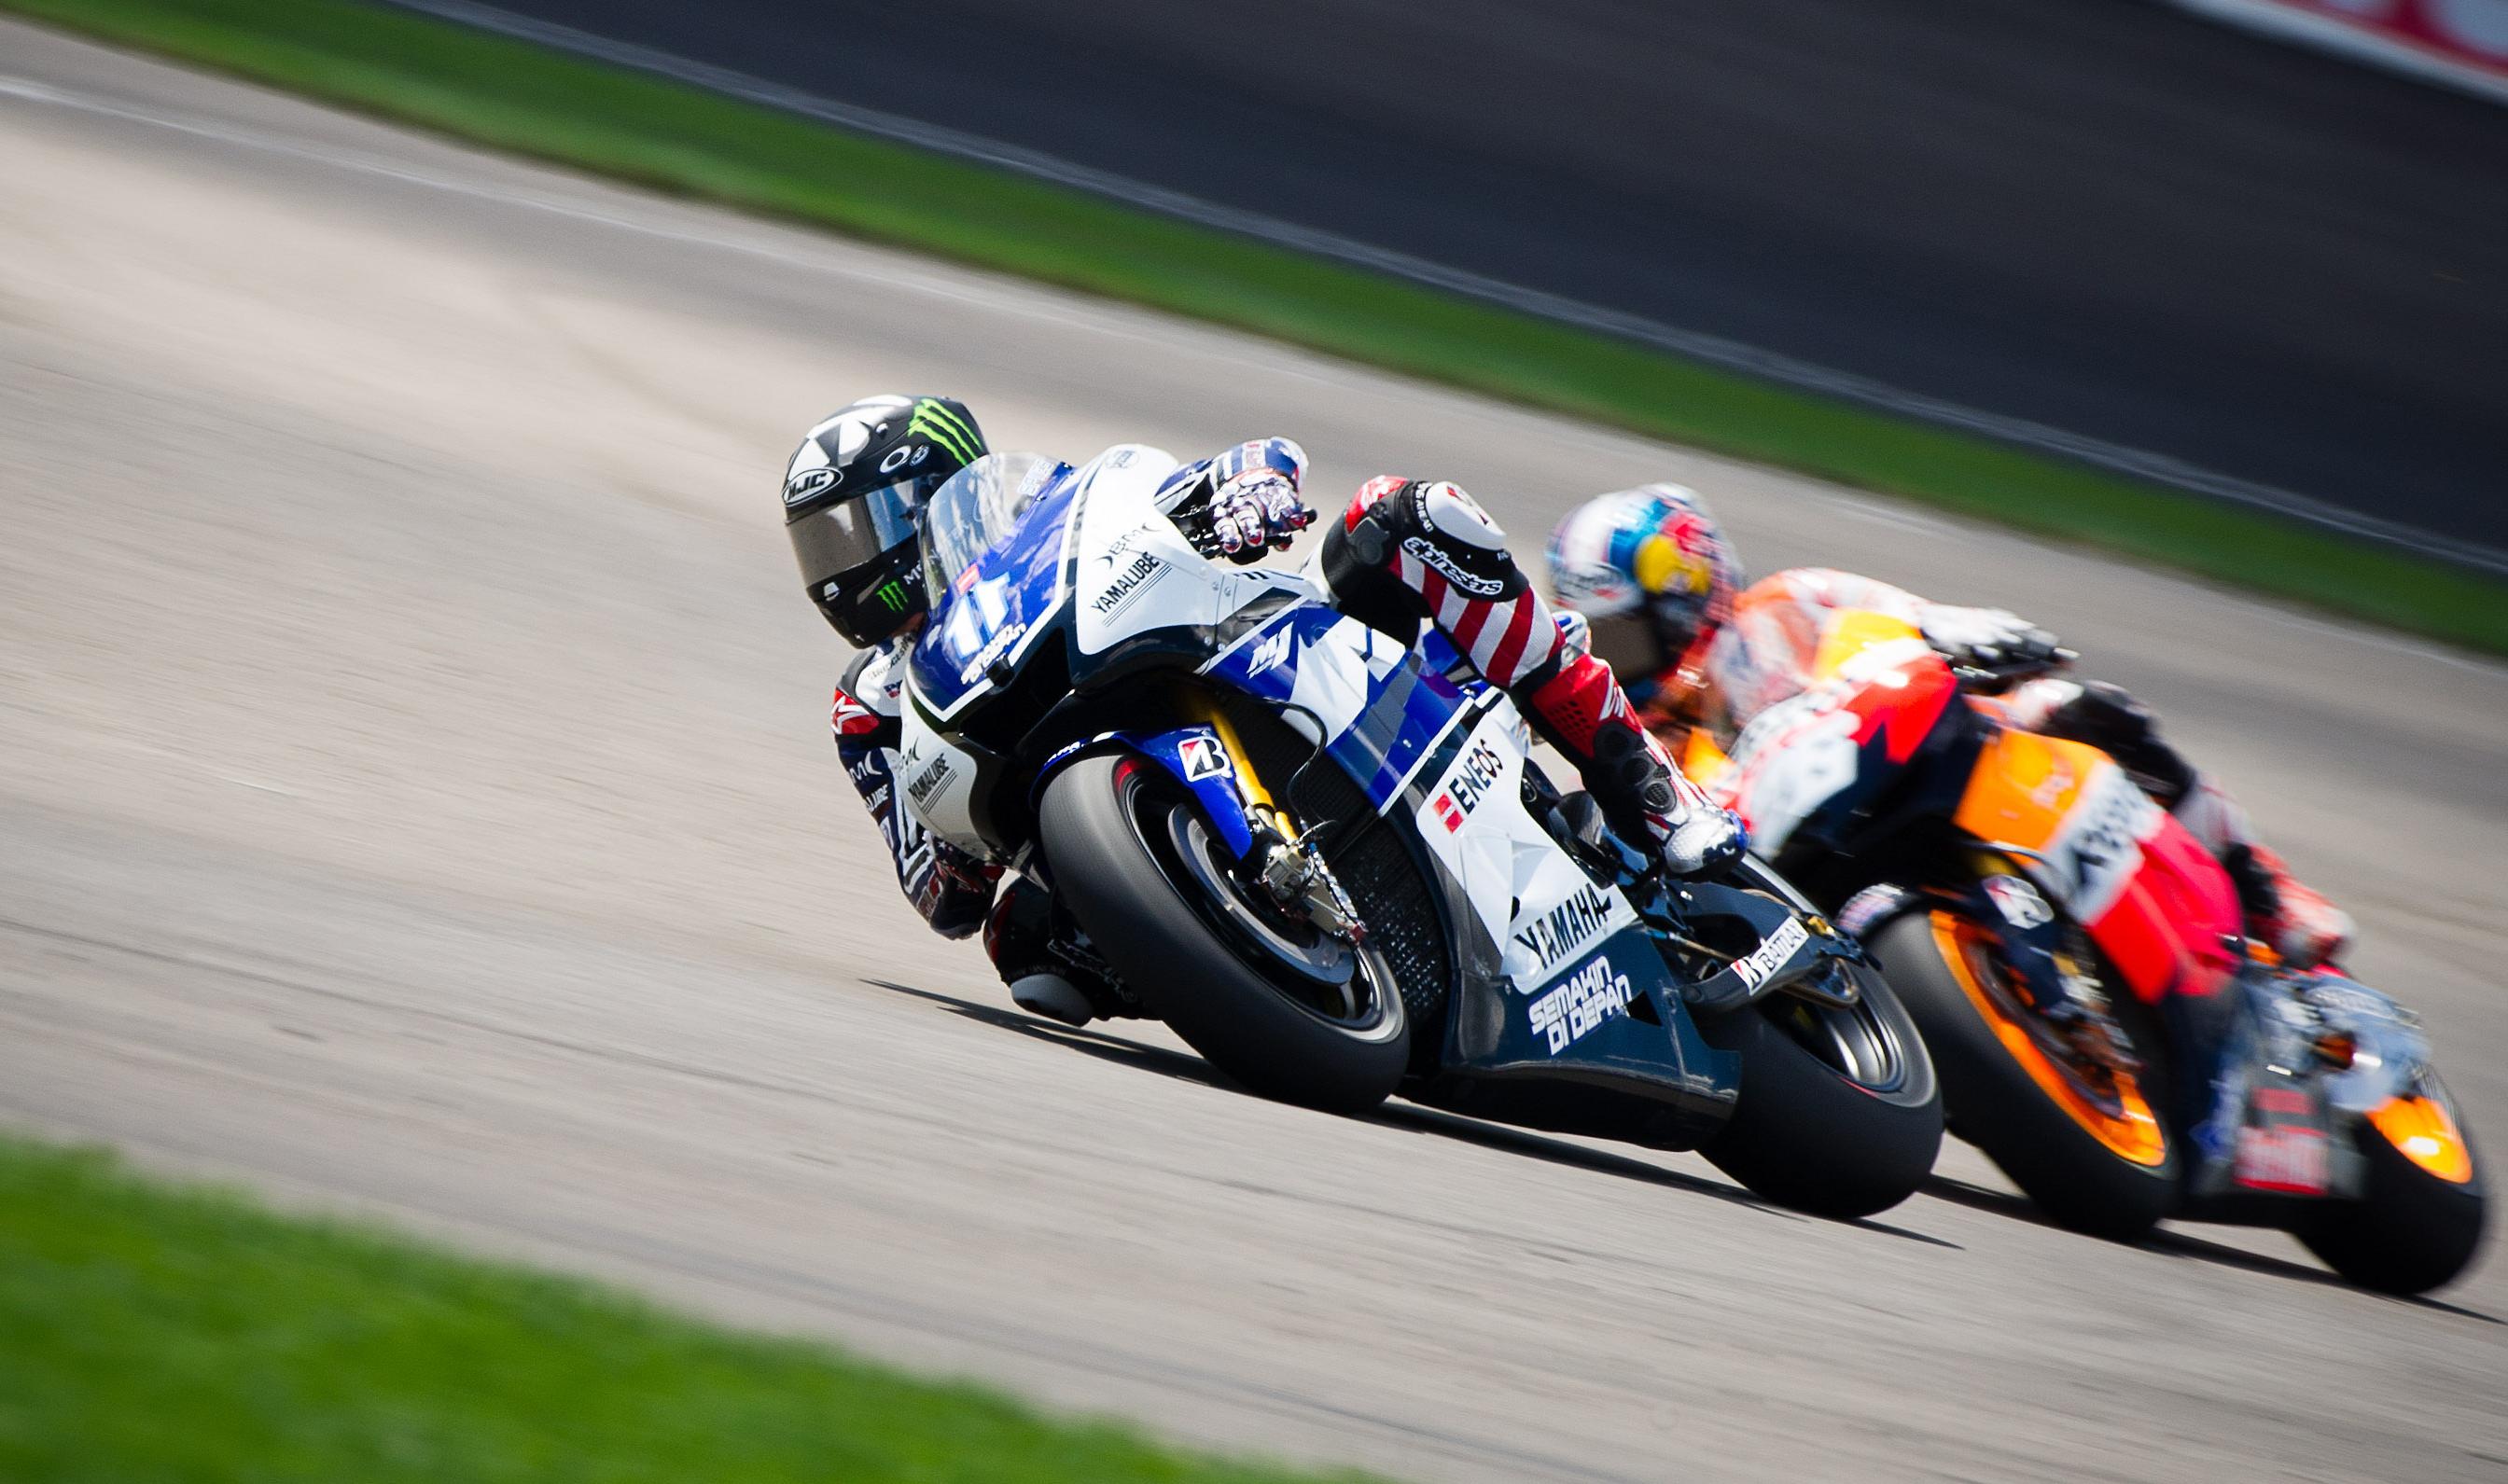 Motorcycle Yamaha MotoGP race racing wallpaper 2688x1591 112894 2688x1591